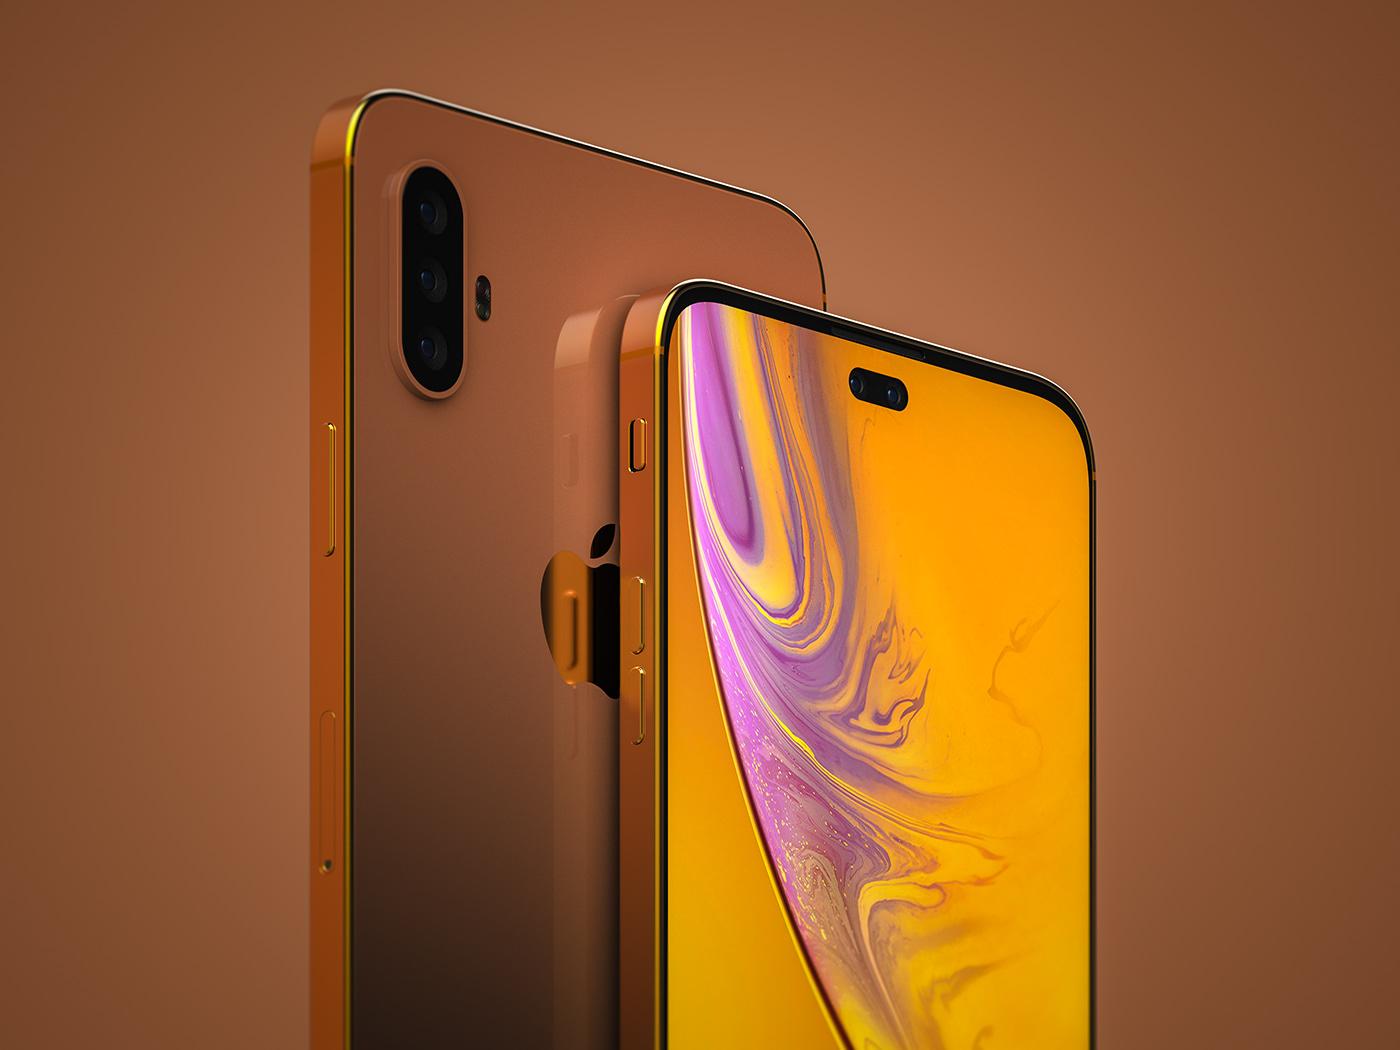 iphone iphonexi iphonexiplus iphonexs2 iphonexsmax concept Conceptdesign conceptphone samsungs10 rendering